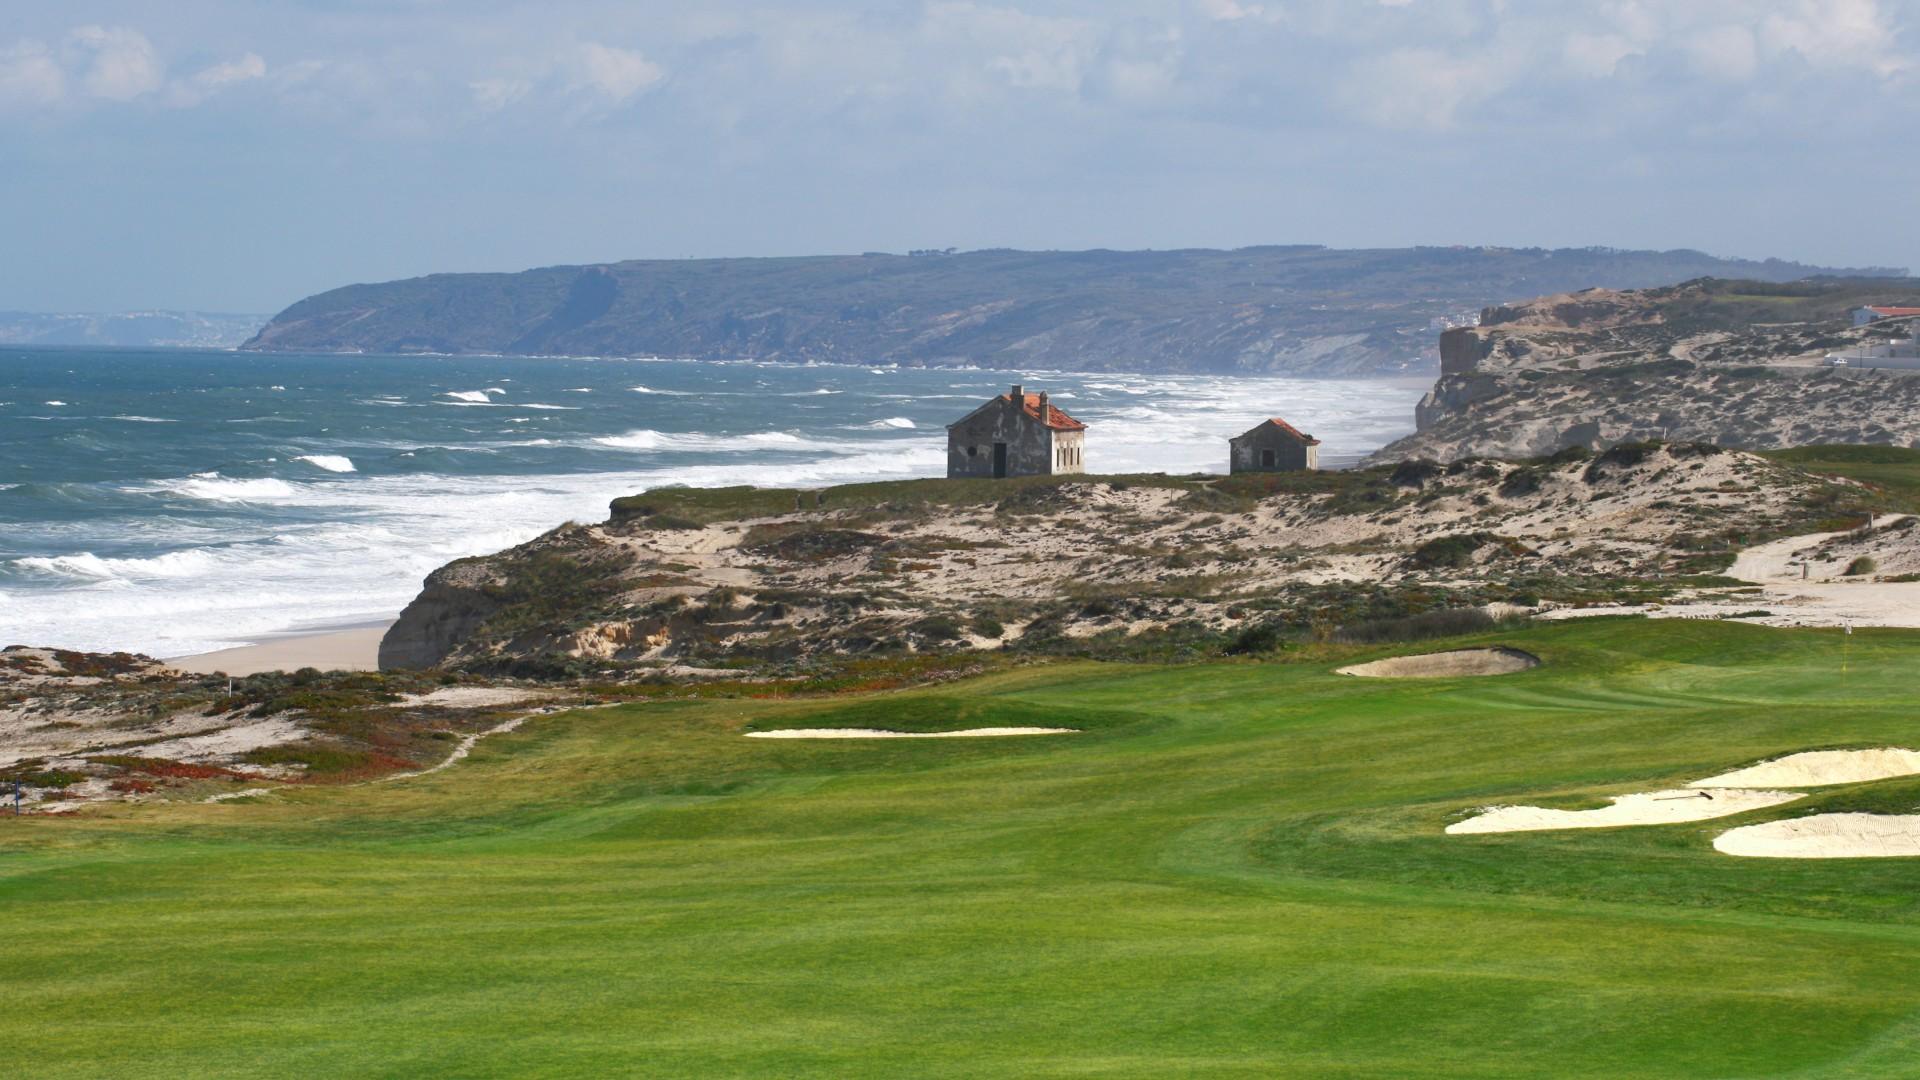 Praia D'el Rey golf course Lisbon Portugal